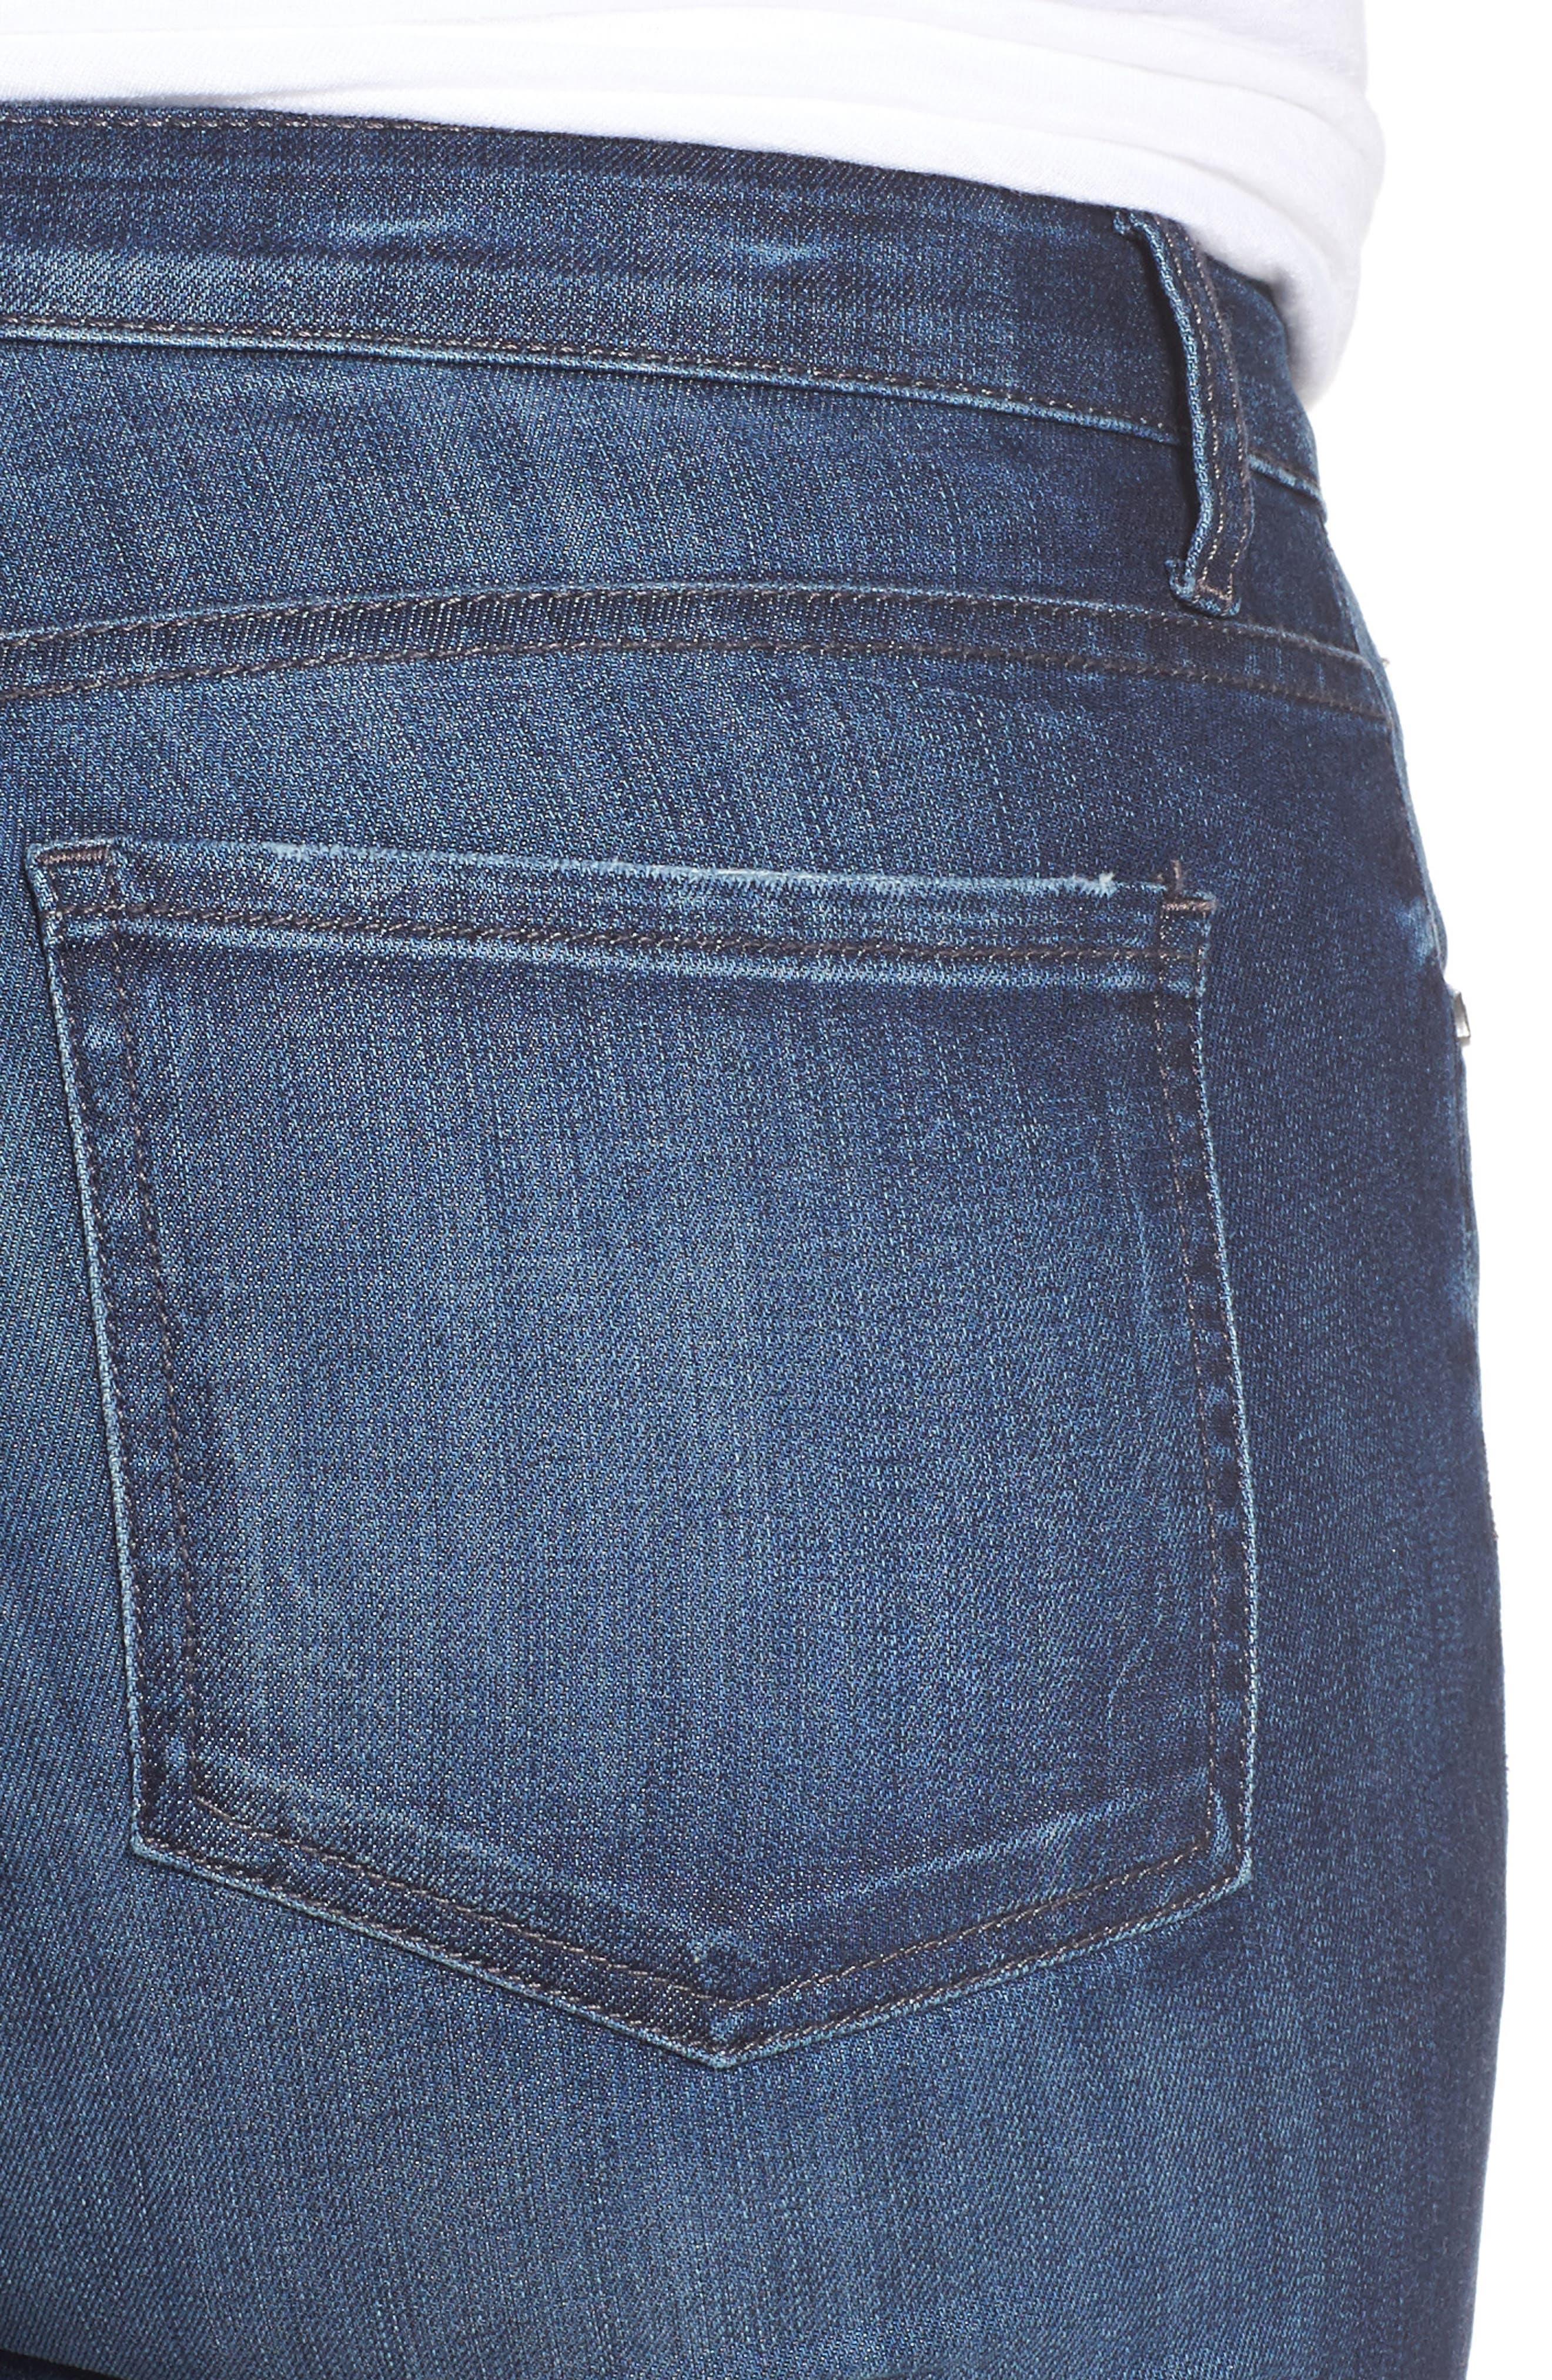 Catherine Boyfriend Jeans,                             Alternate thumbnail 4, color,                             400